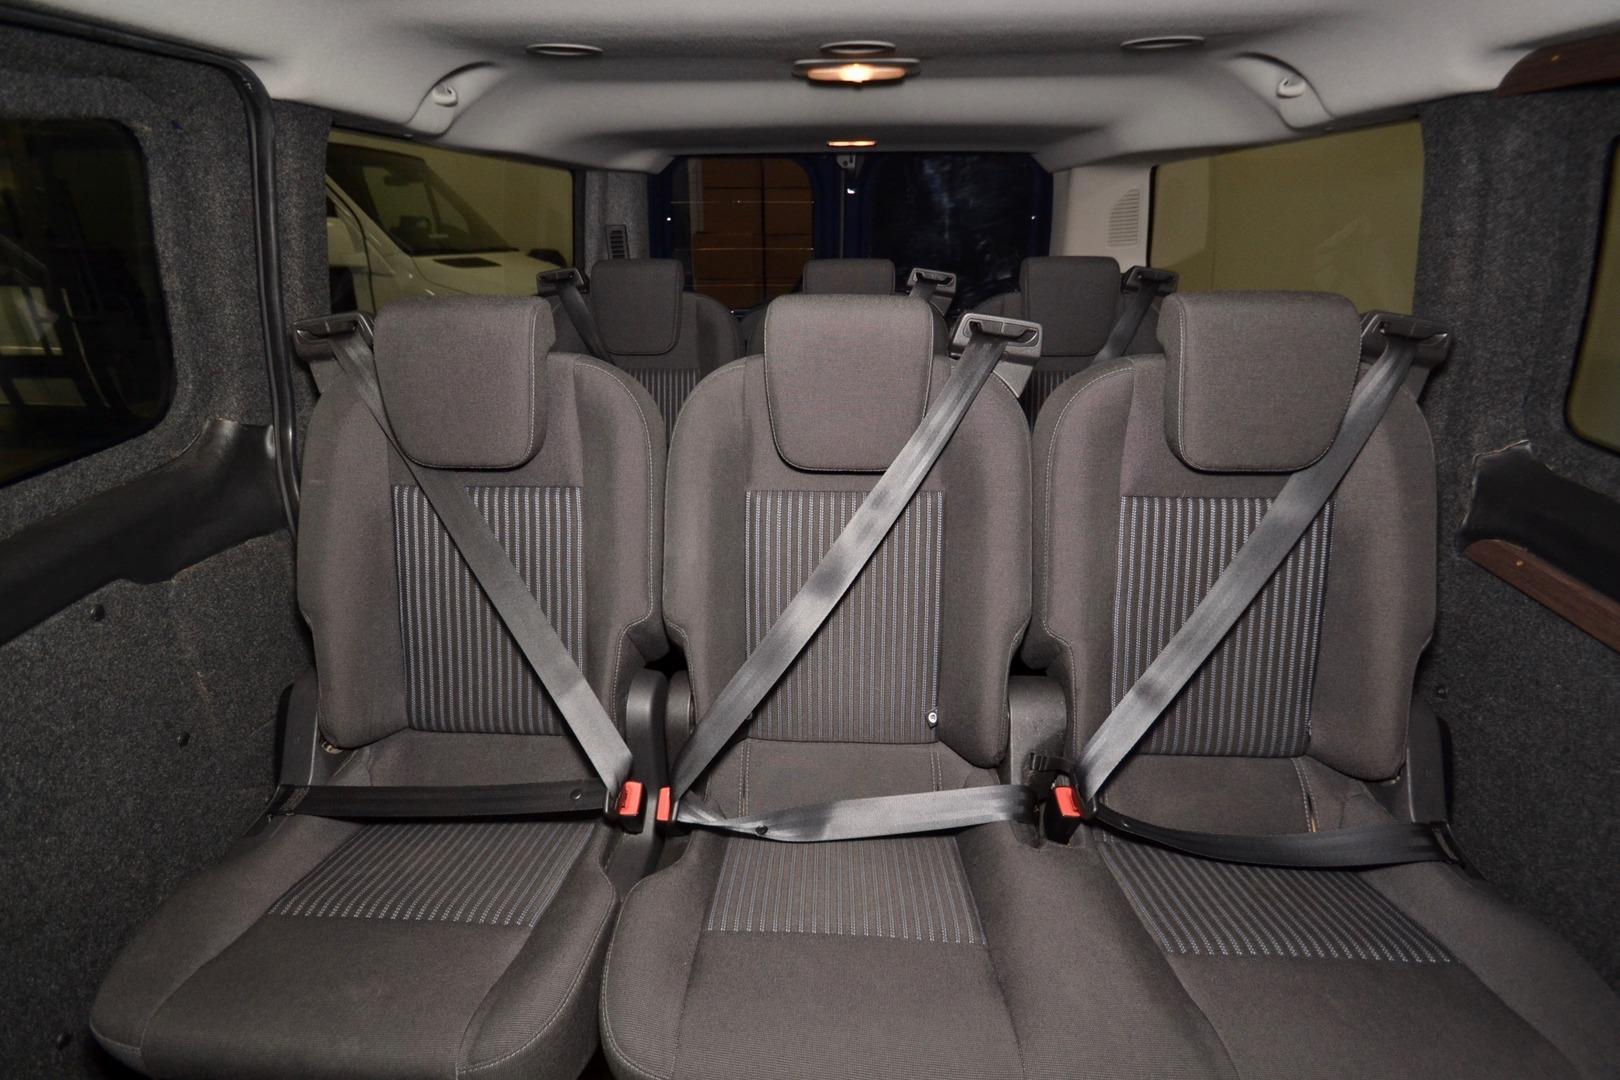 Ford Tourneo Custom, 300 2,2TDCi 125 hv Trend M6 M1 L2H1 FWD